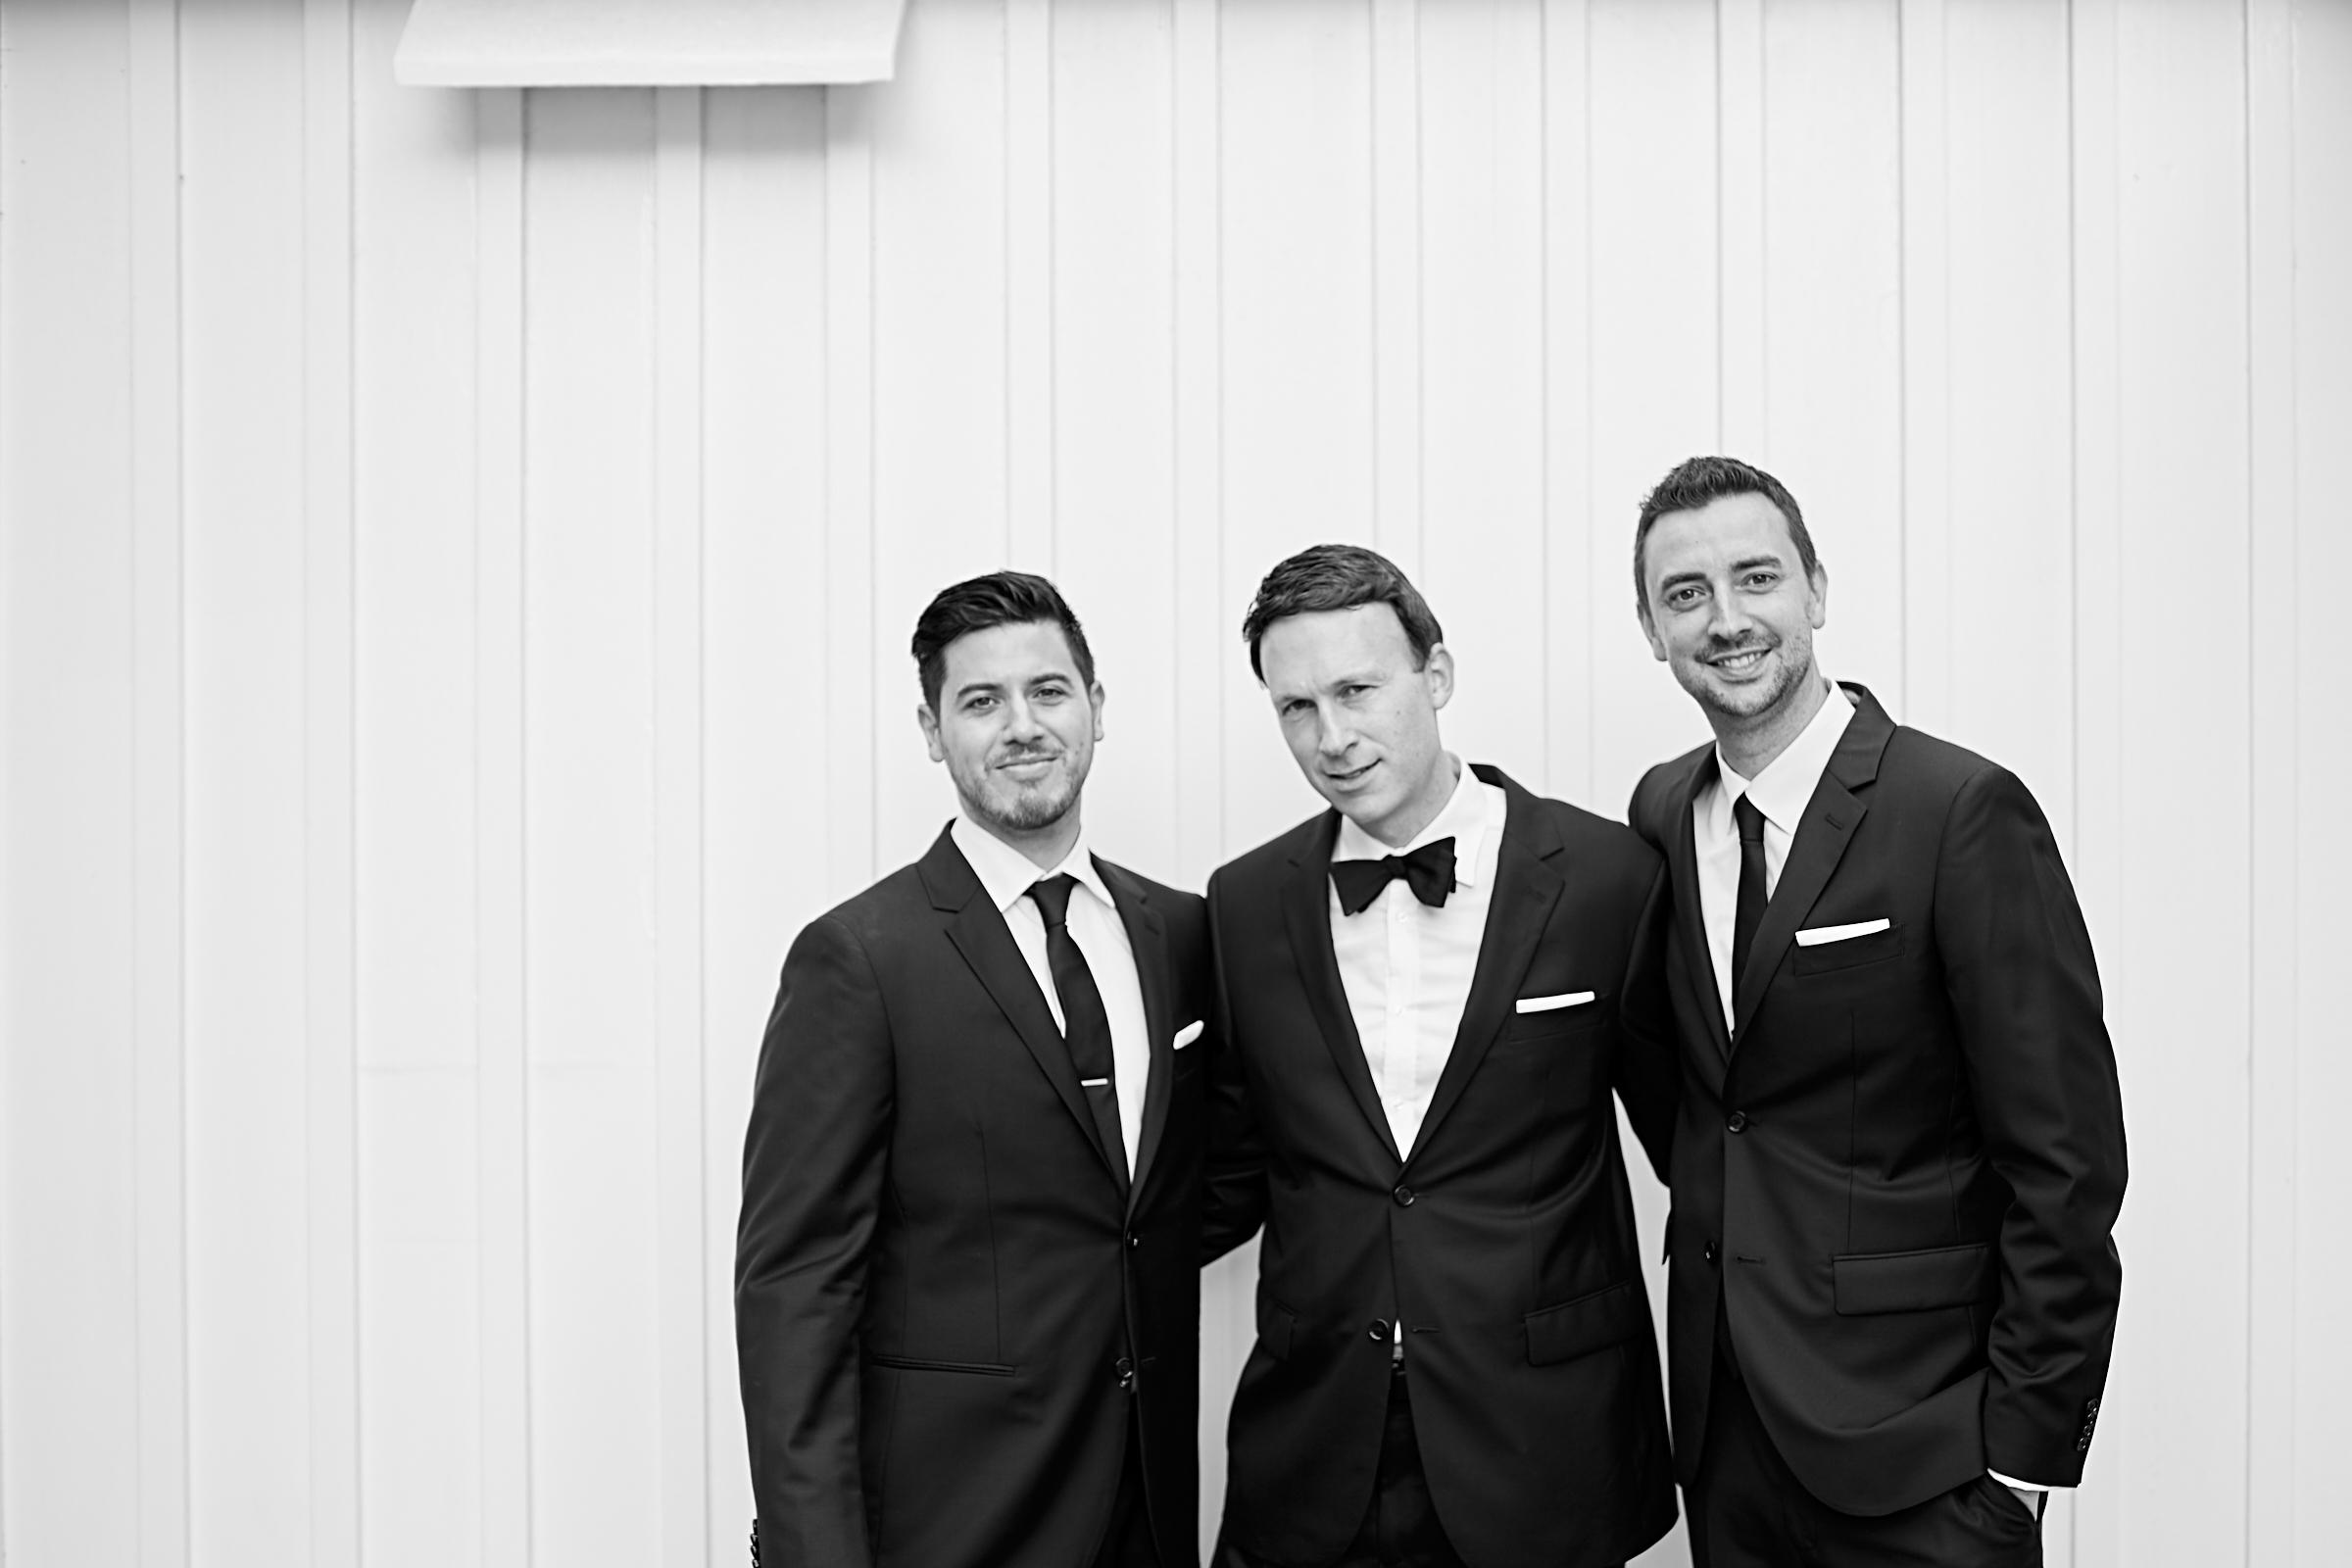 Classic wedding photographers